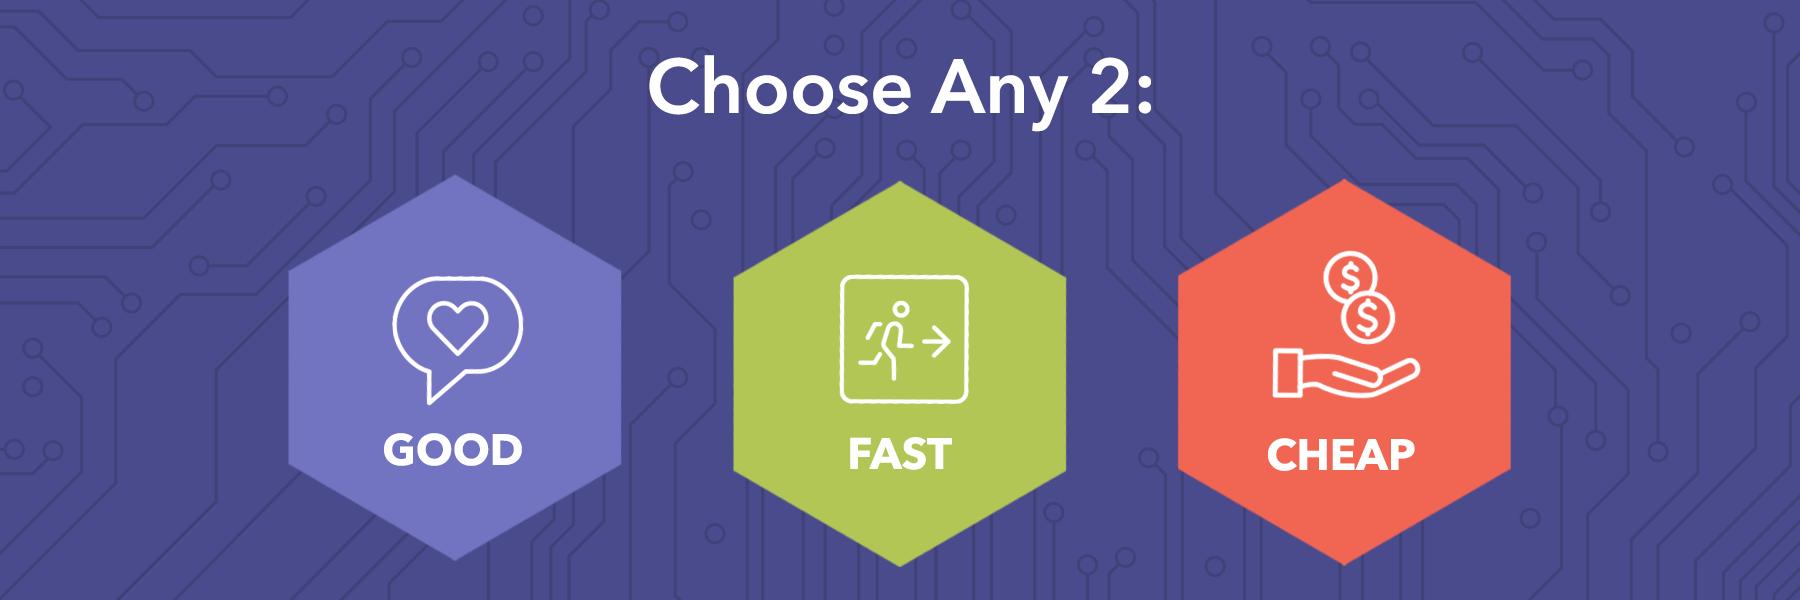 Choose any 2: Good, Fast, Cheap.